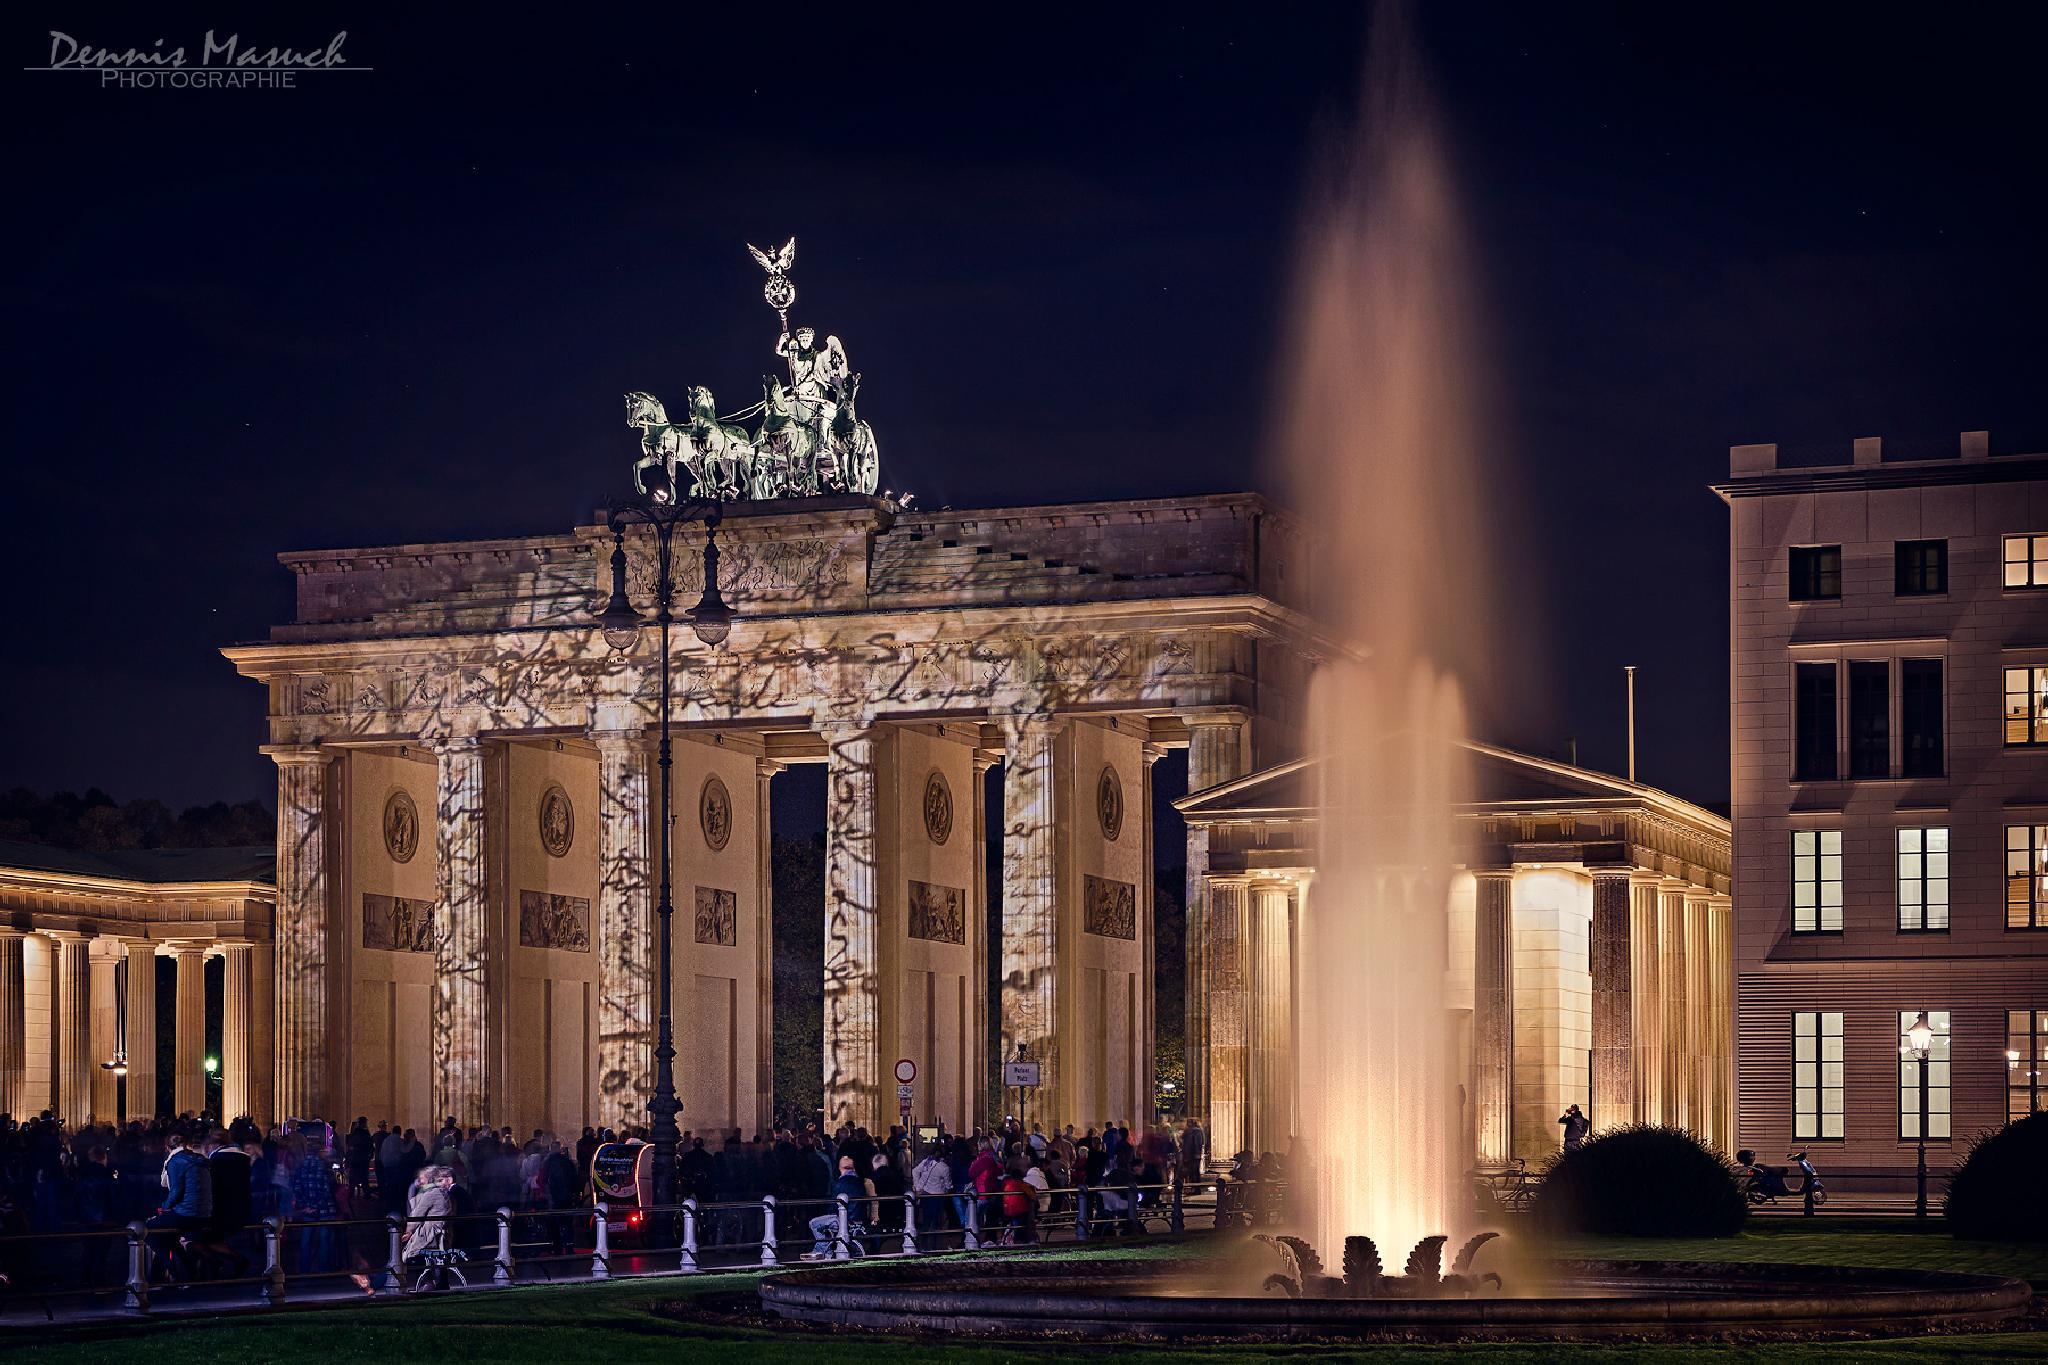 Brandenburger Tor beim Festival of Lights 2014 by Dennis Masuch